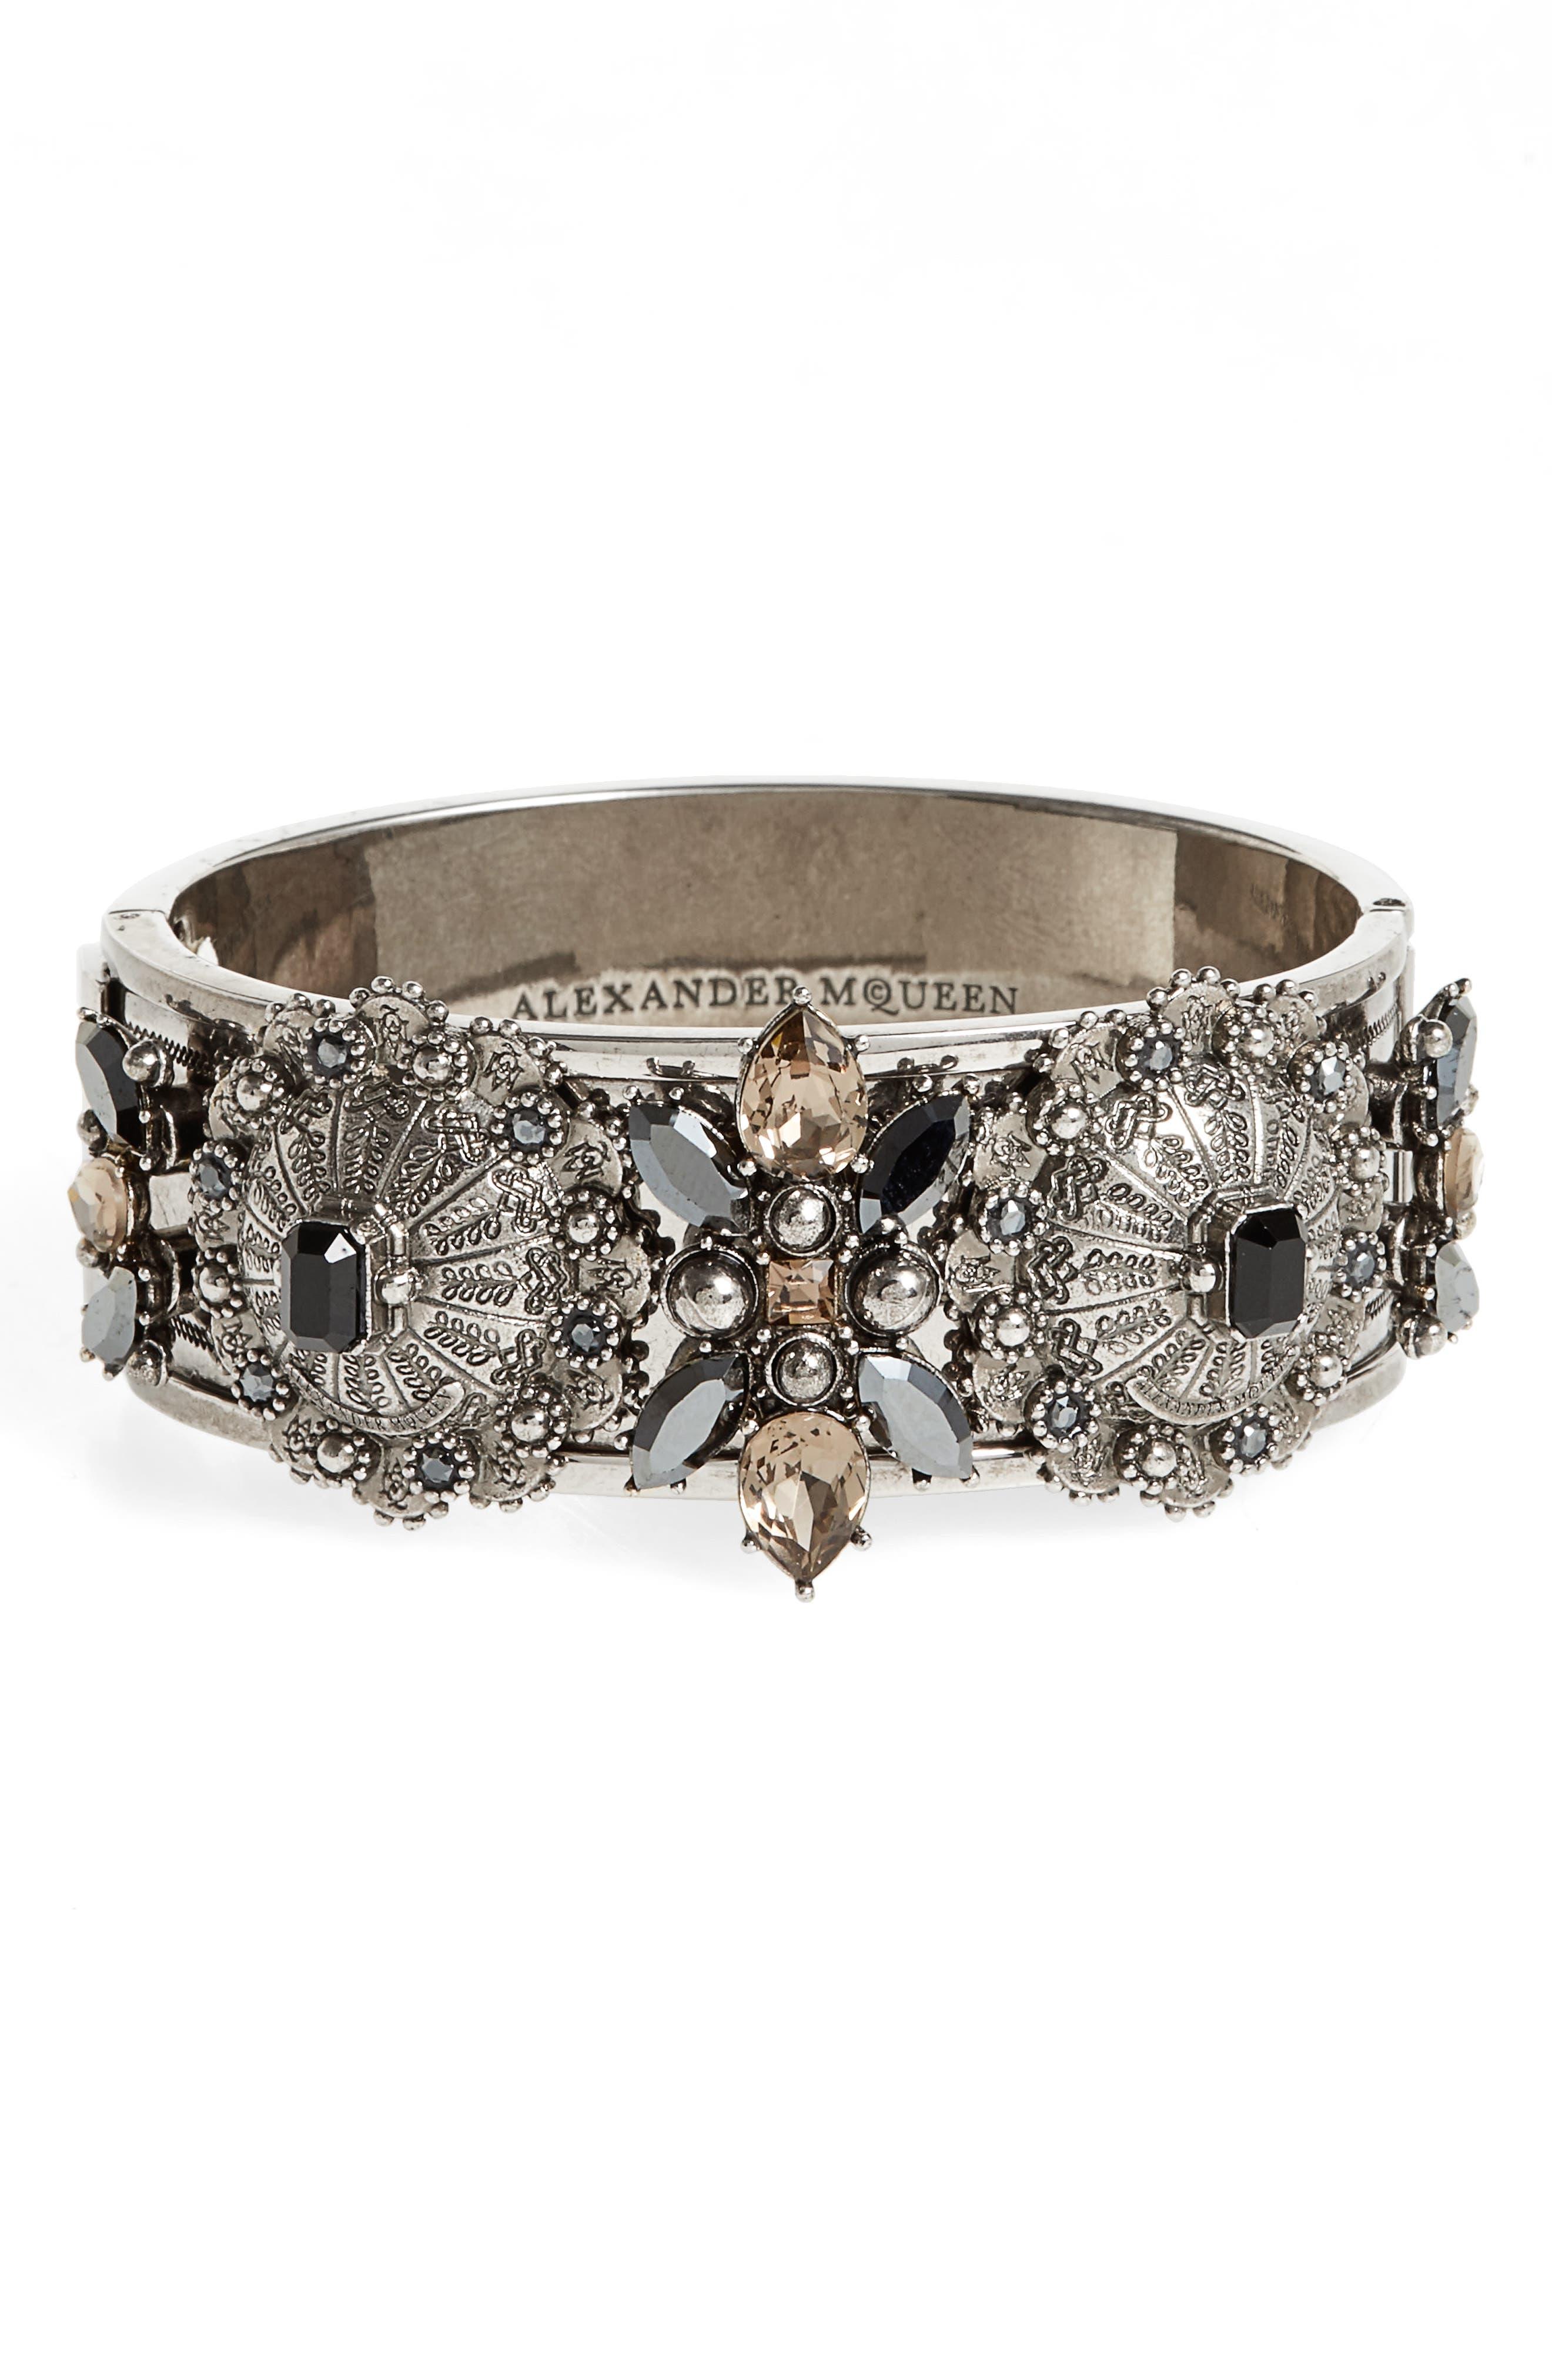 Alexander McQueen Jeweled Hinge Cuff